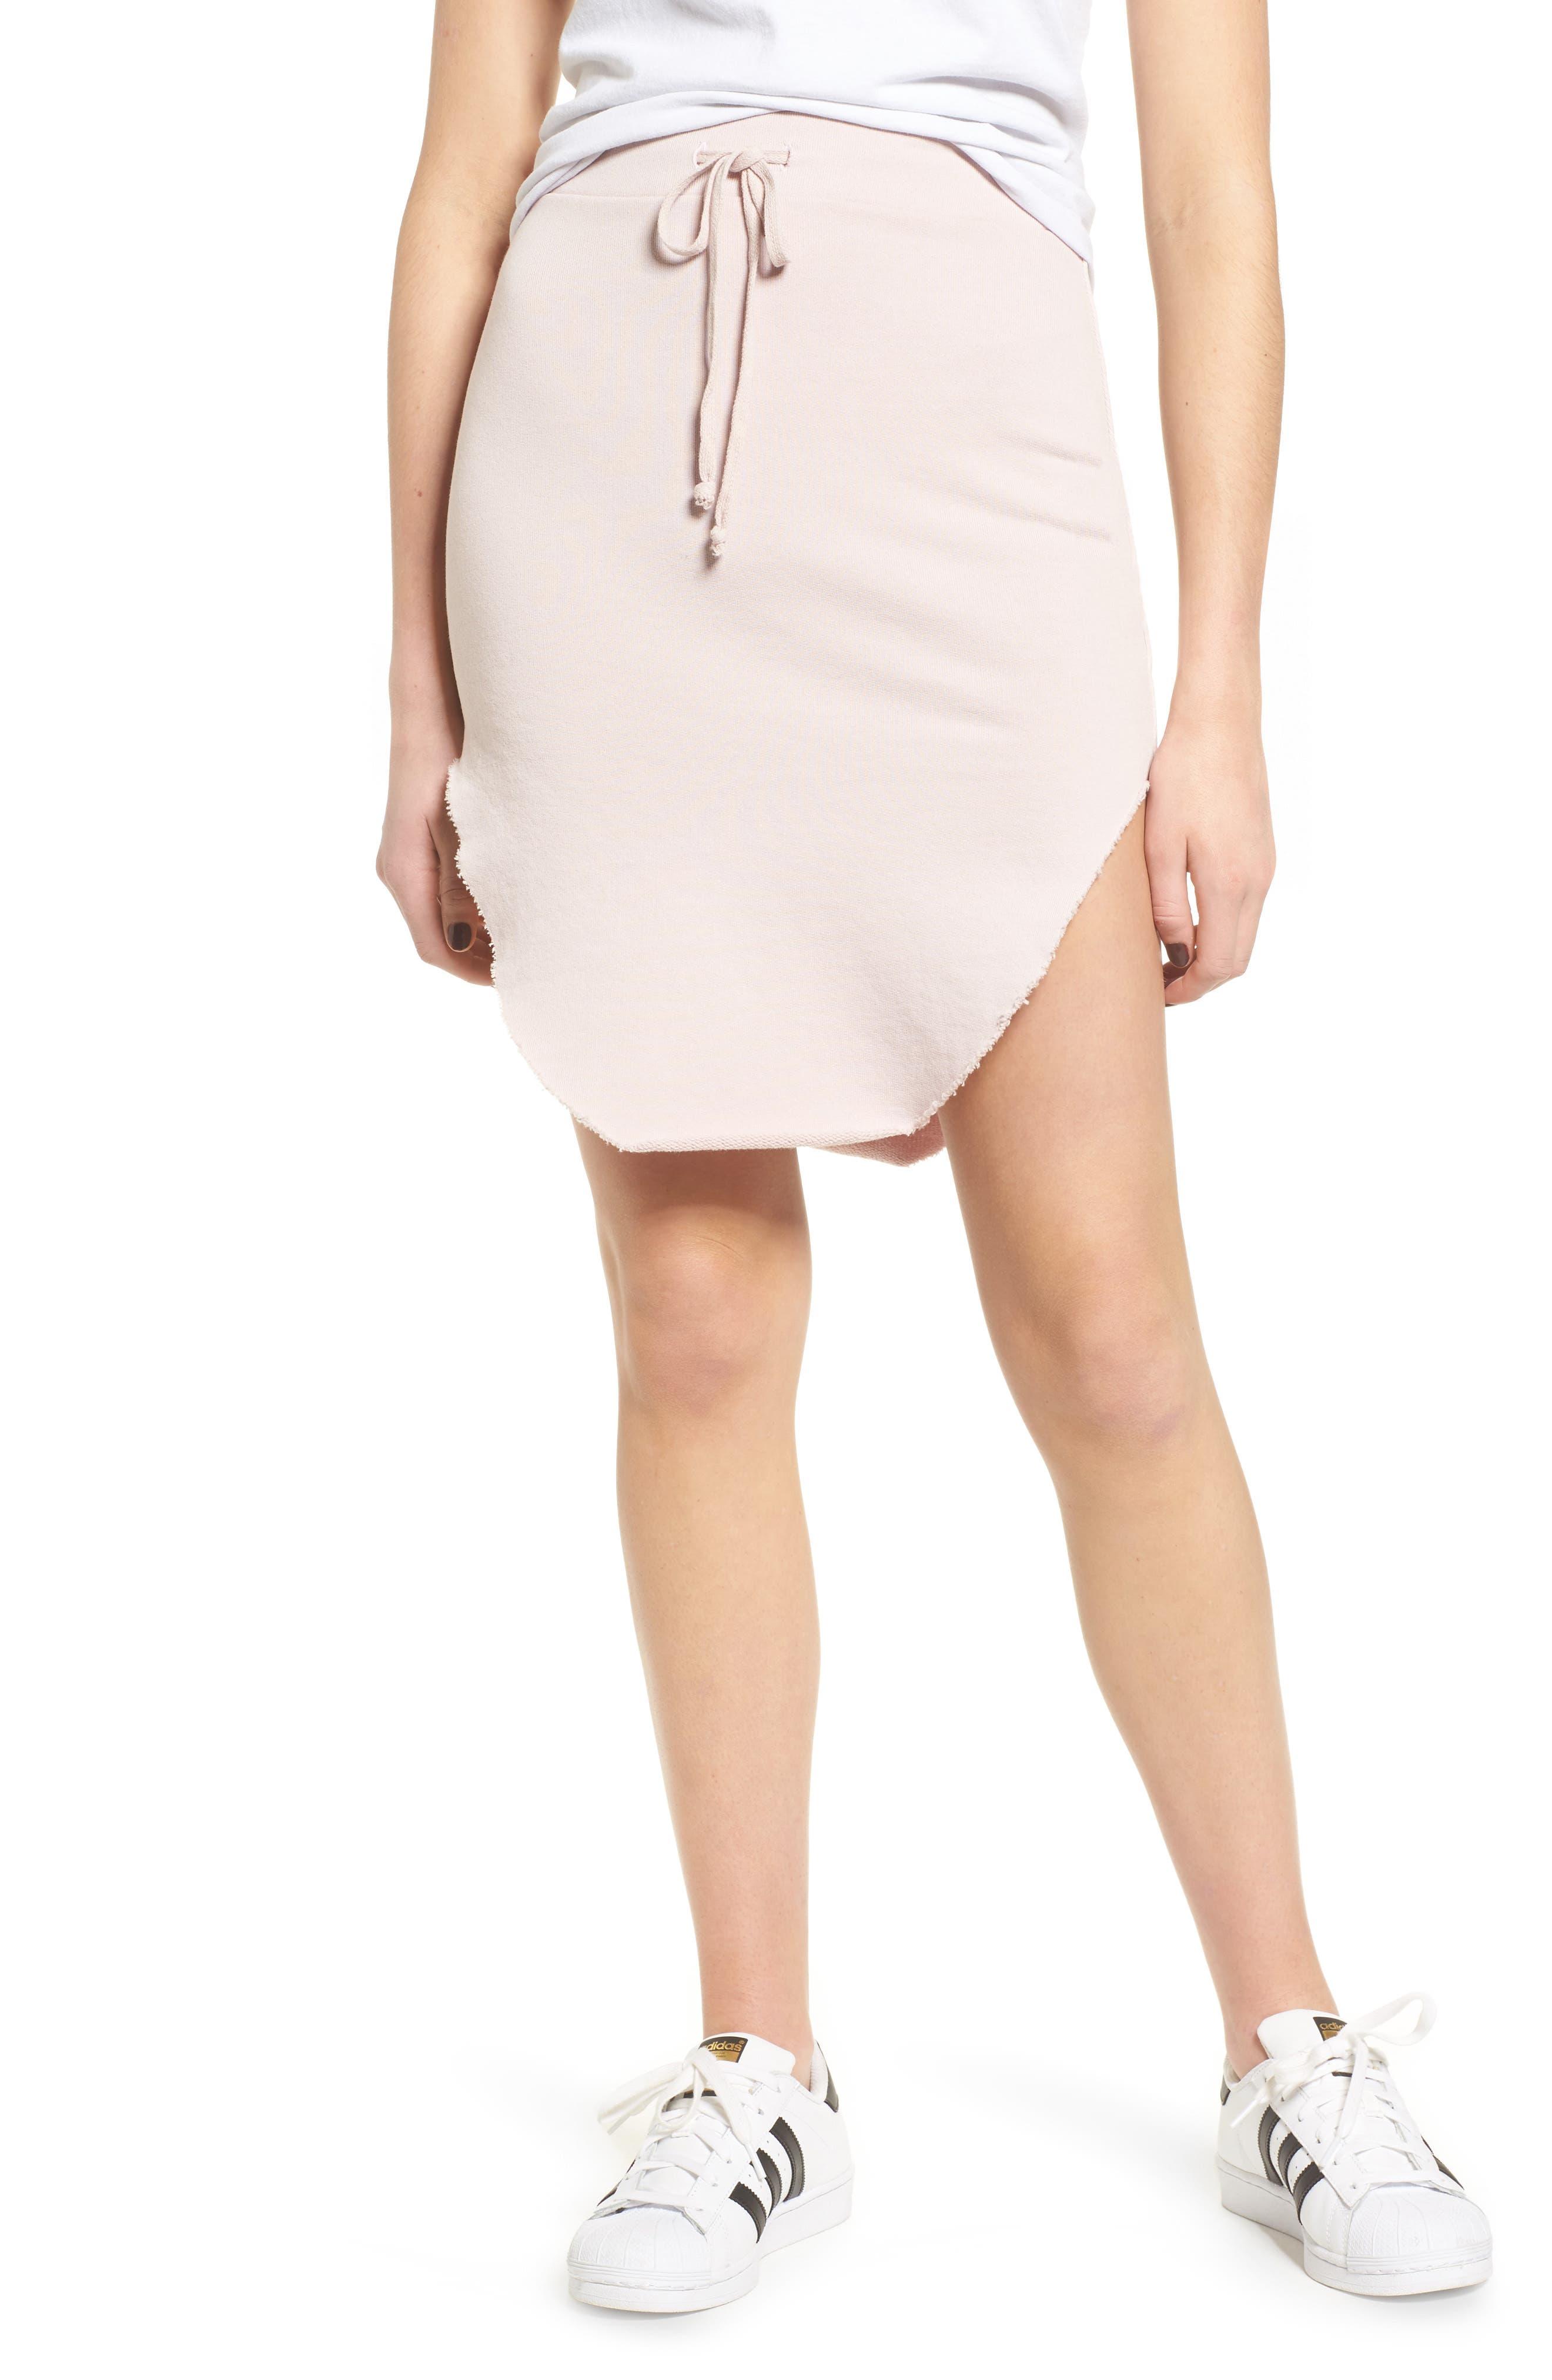 Main Image - Frank & Eileen Tee Lab Short Fleece Skirt